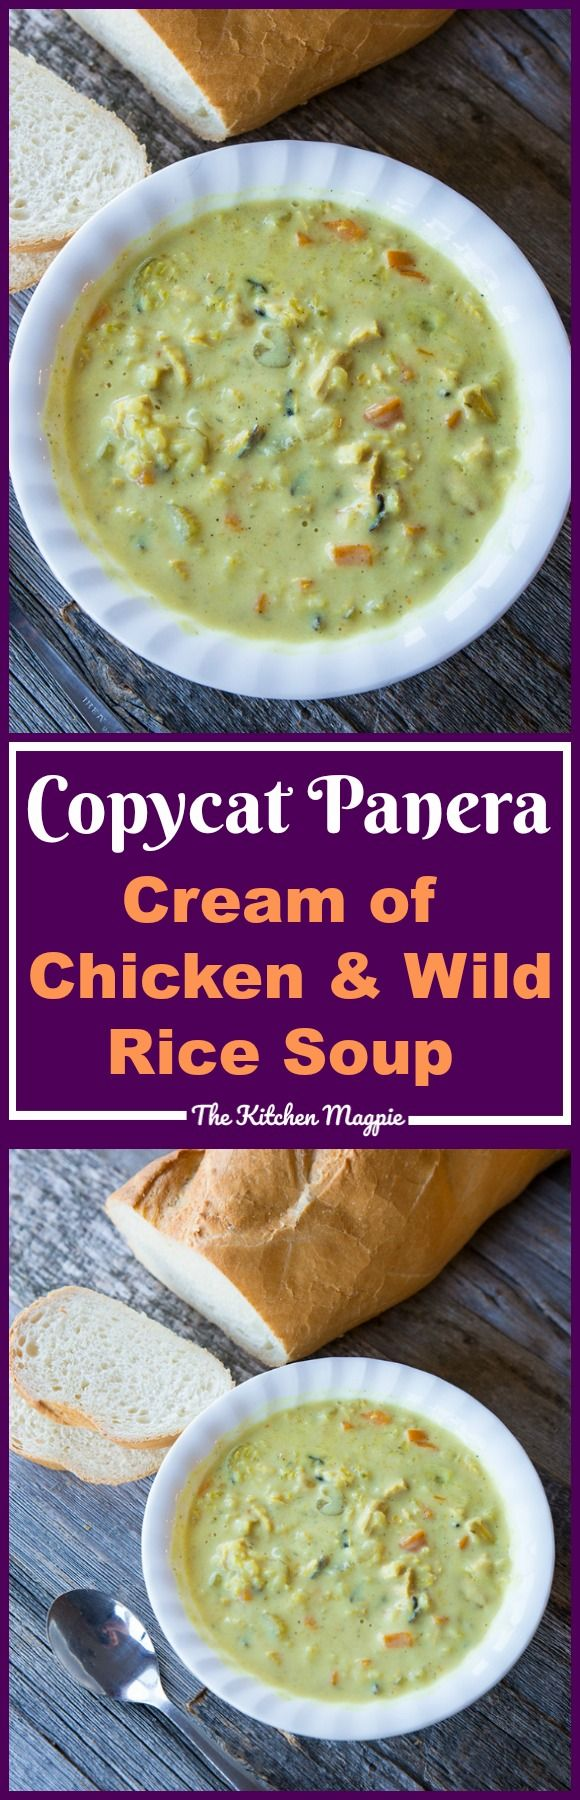 CREAM OF CHICKEN & WILD RICE SOUP (PANERA COPYCAT)